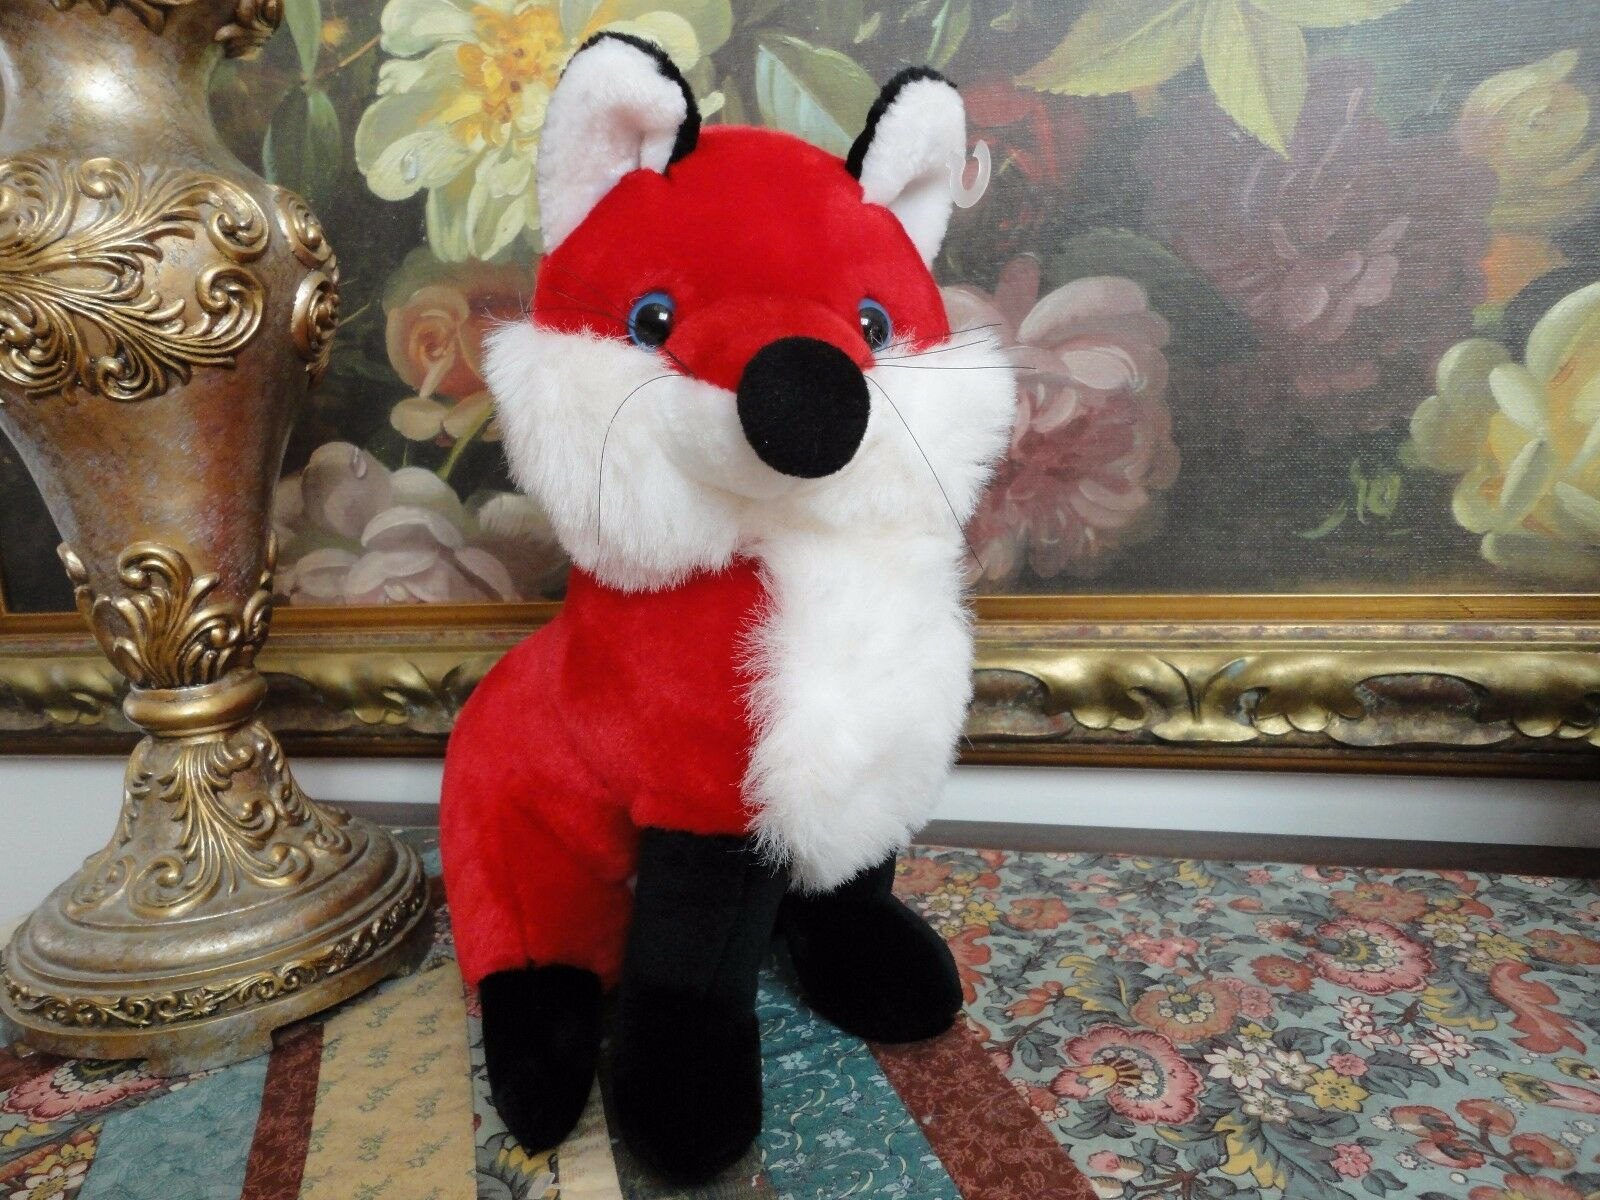 Mardi Gras FOX Stuffed Plush Nuovo Orleans Louisiana 12 inch Collectible